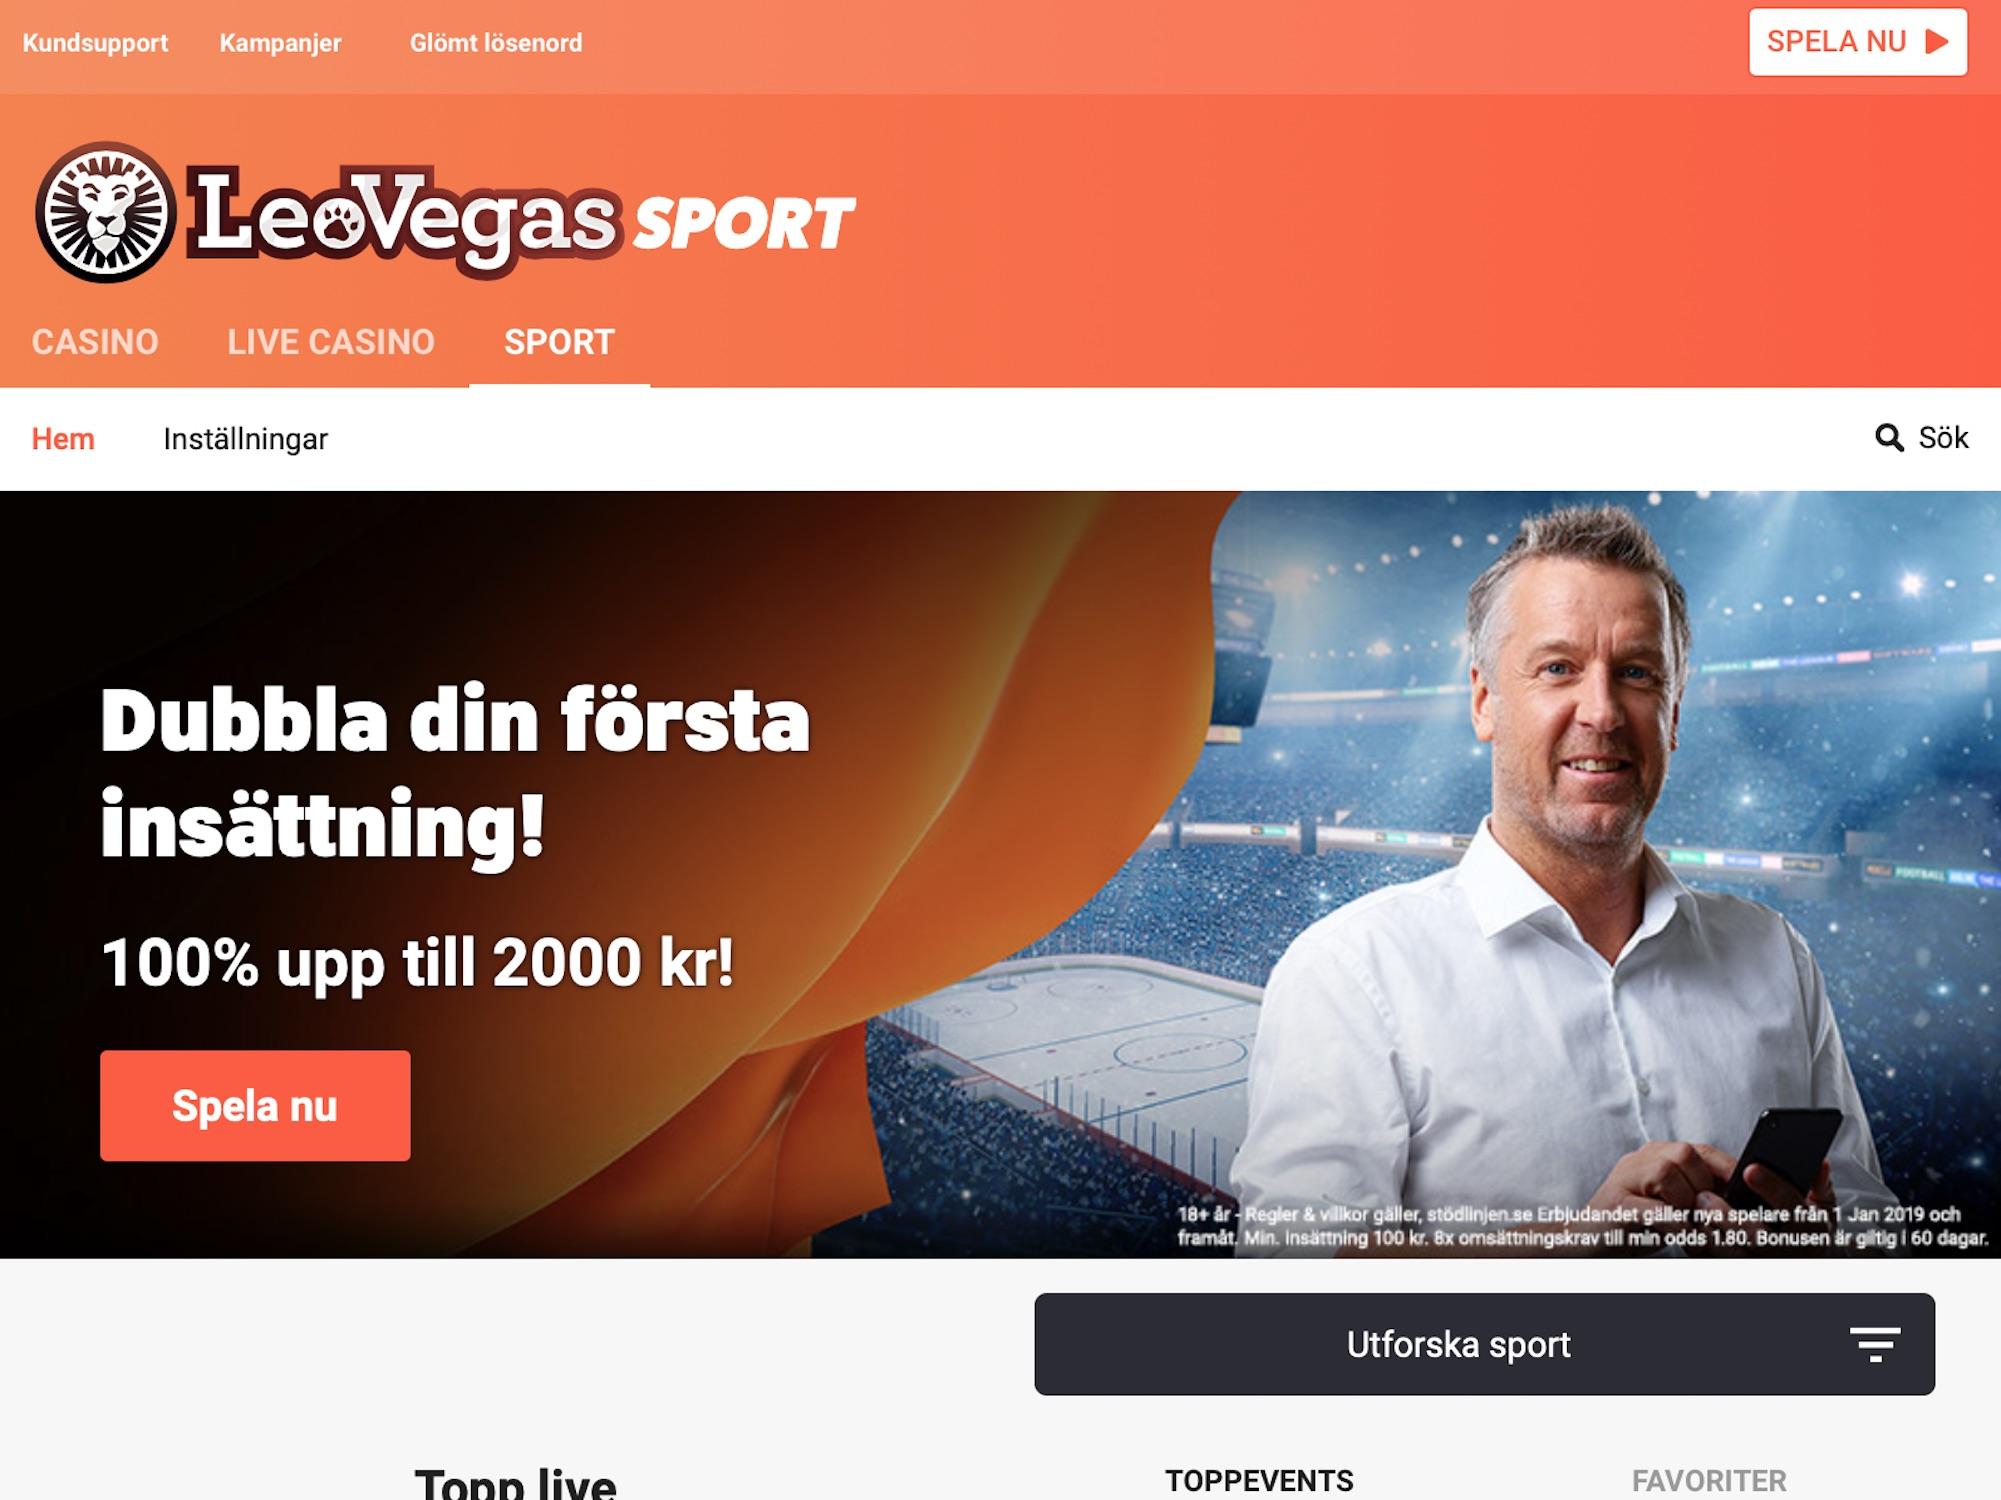 Powerball vinnare - 4856